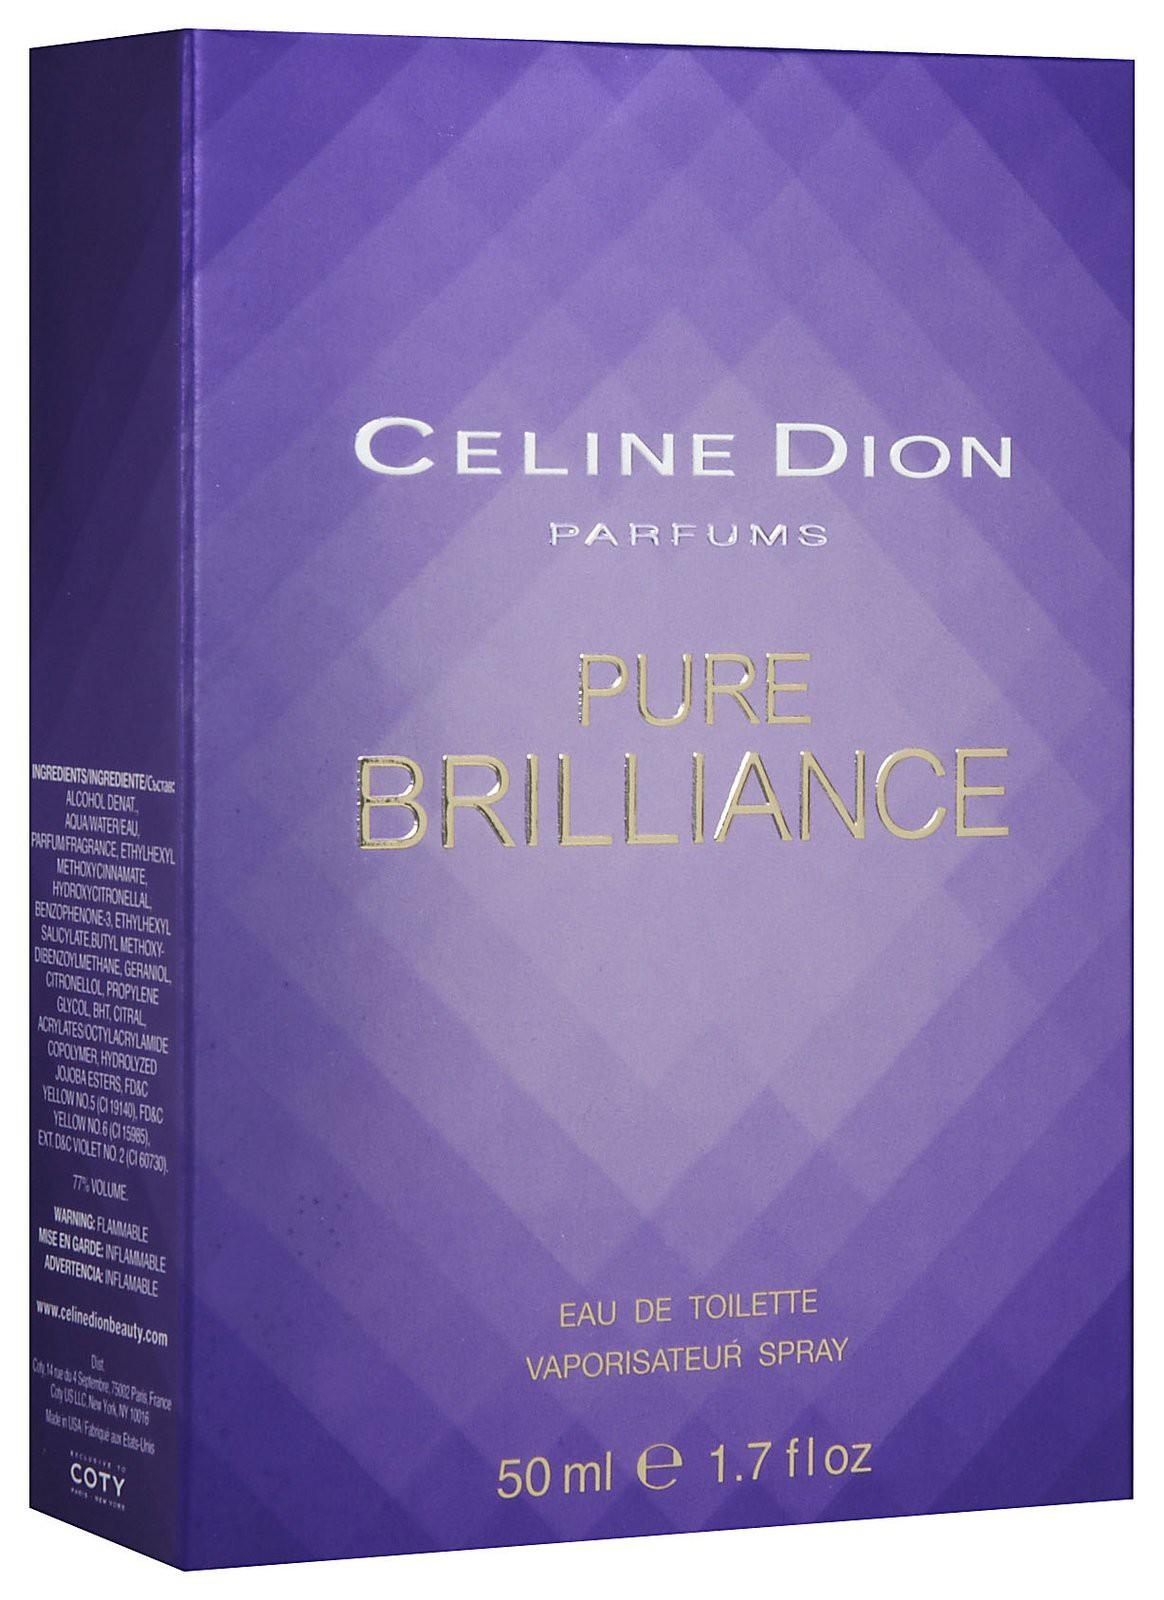 Celine Dion Pure Brilliance аромат для женщин